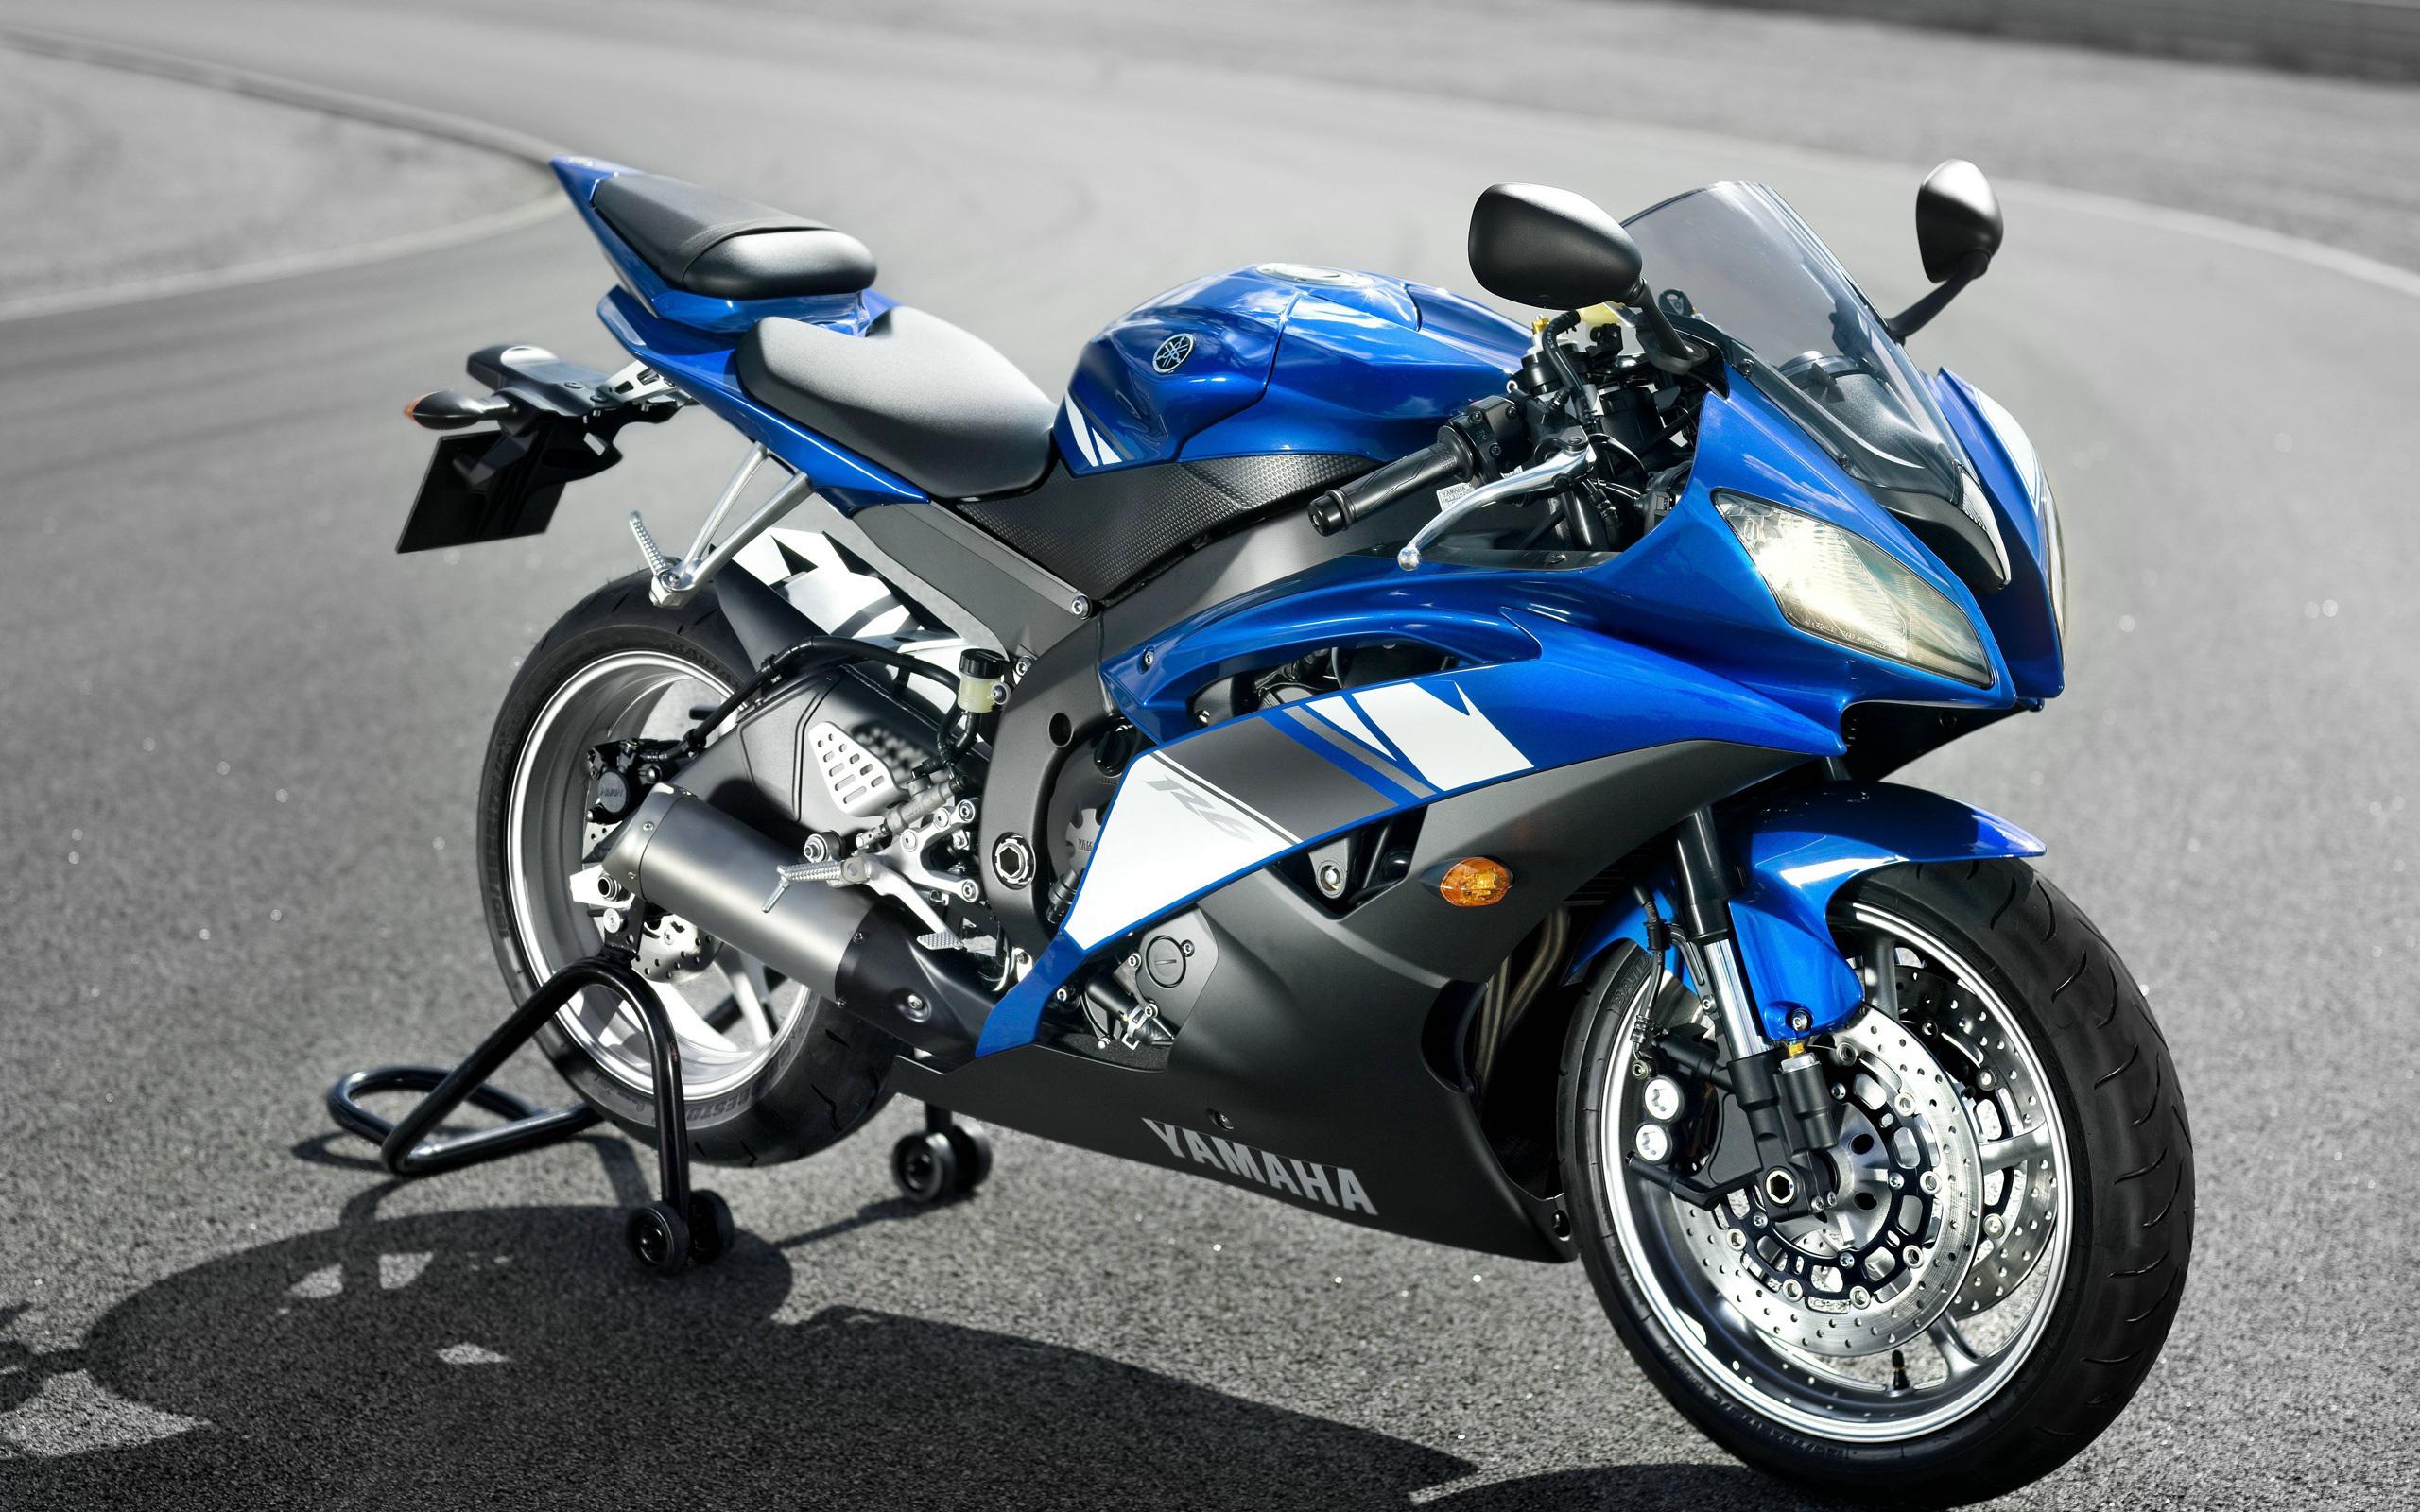 Wallpaper : car, motorcycle, Yamaha YZF R6, Suzuki, wheel ...